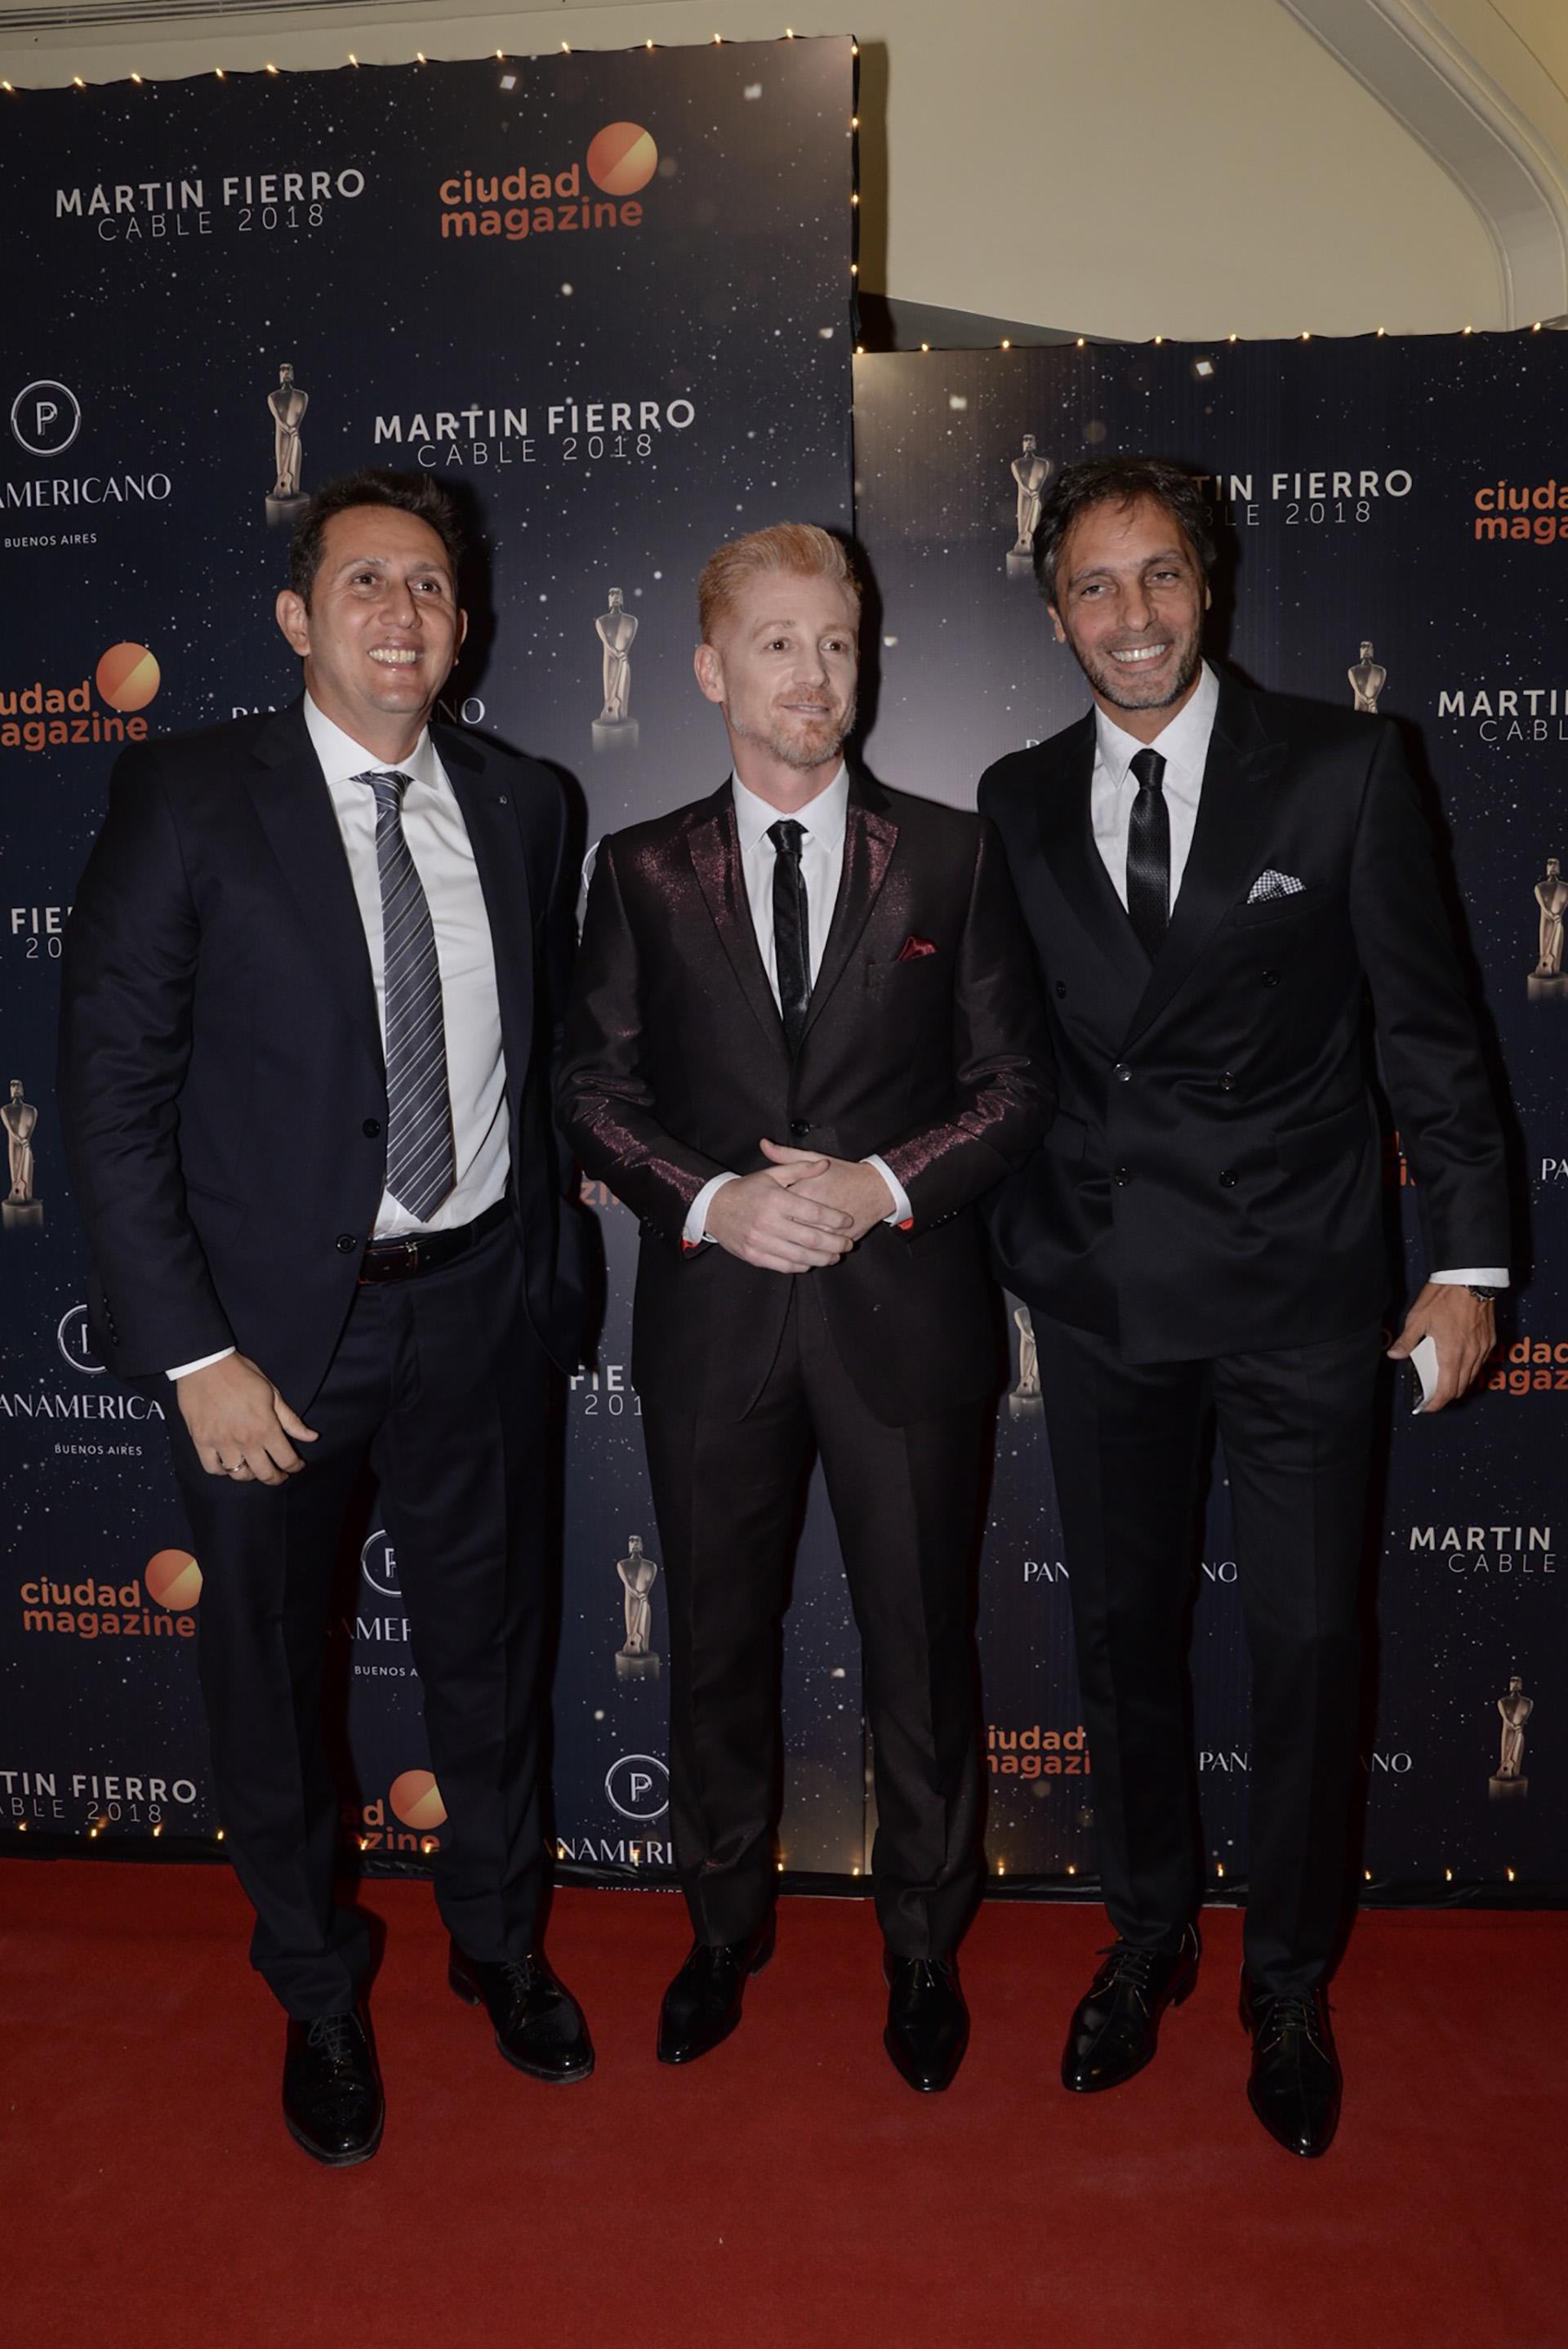 Juan Pablo Varsky, Martin Liberman, y Gustavo López (Julieta Ferrario)